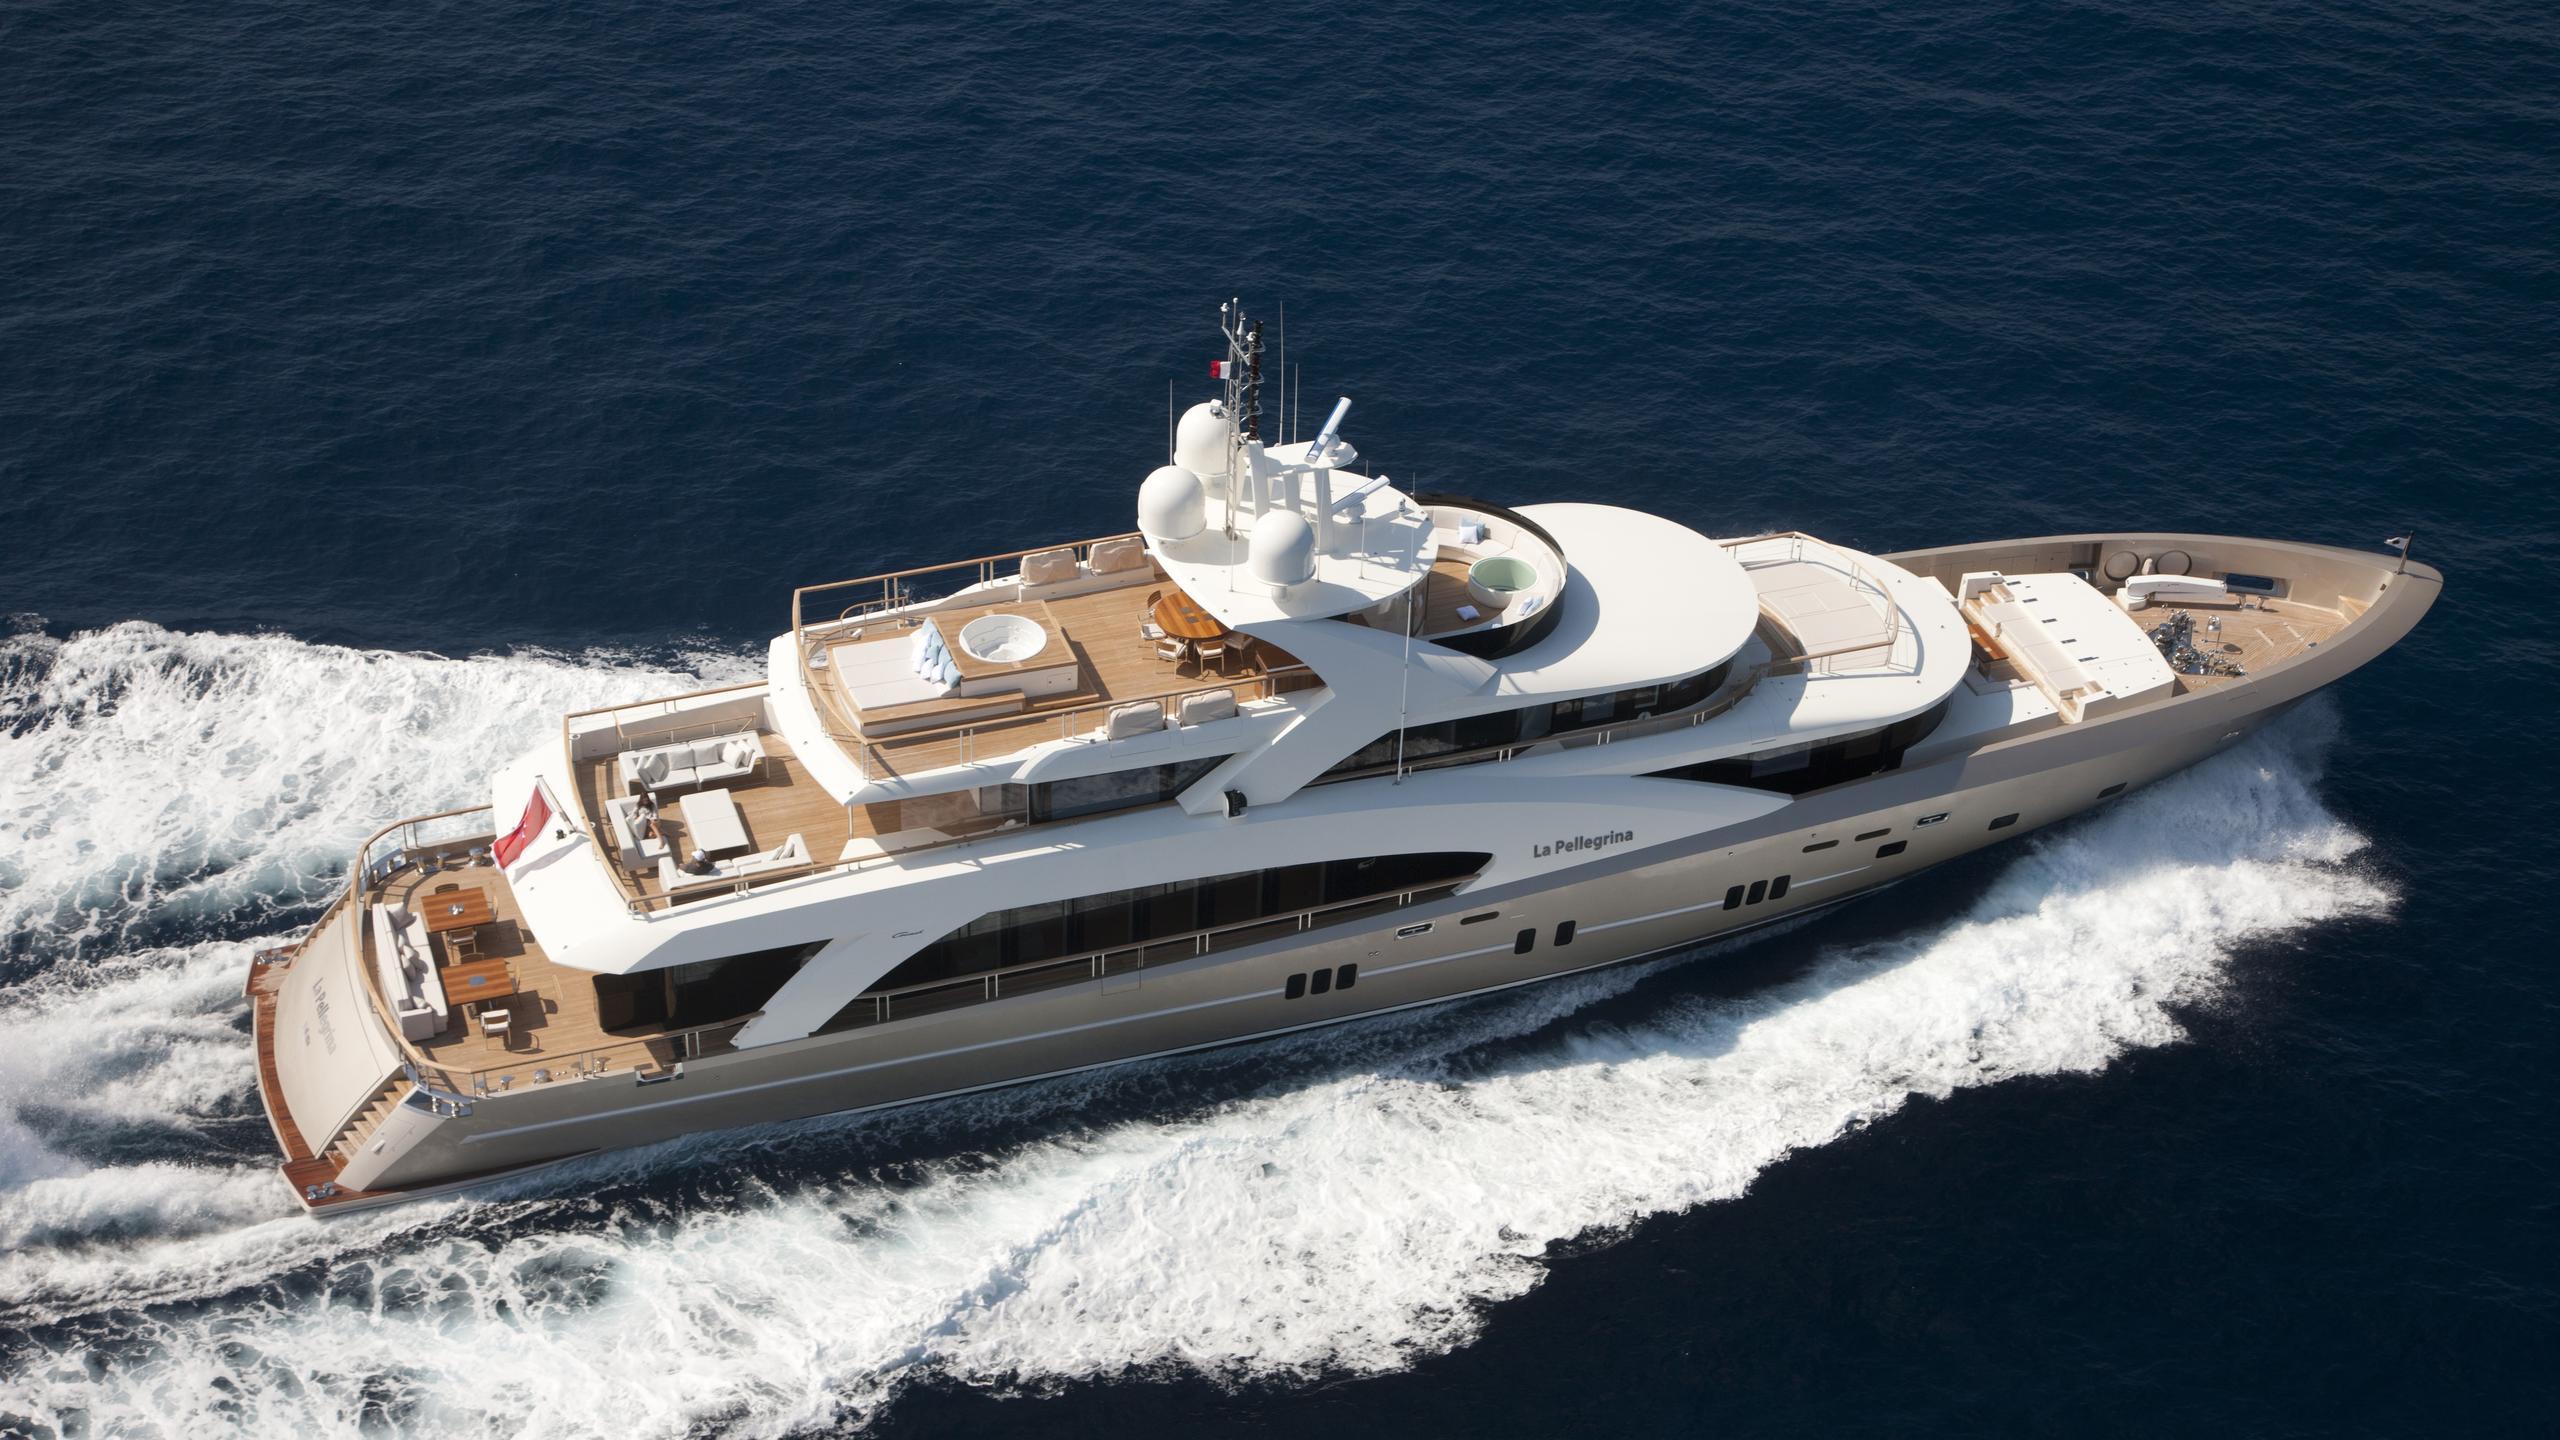 La-Pellegrina-yacht-cruising